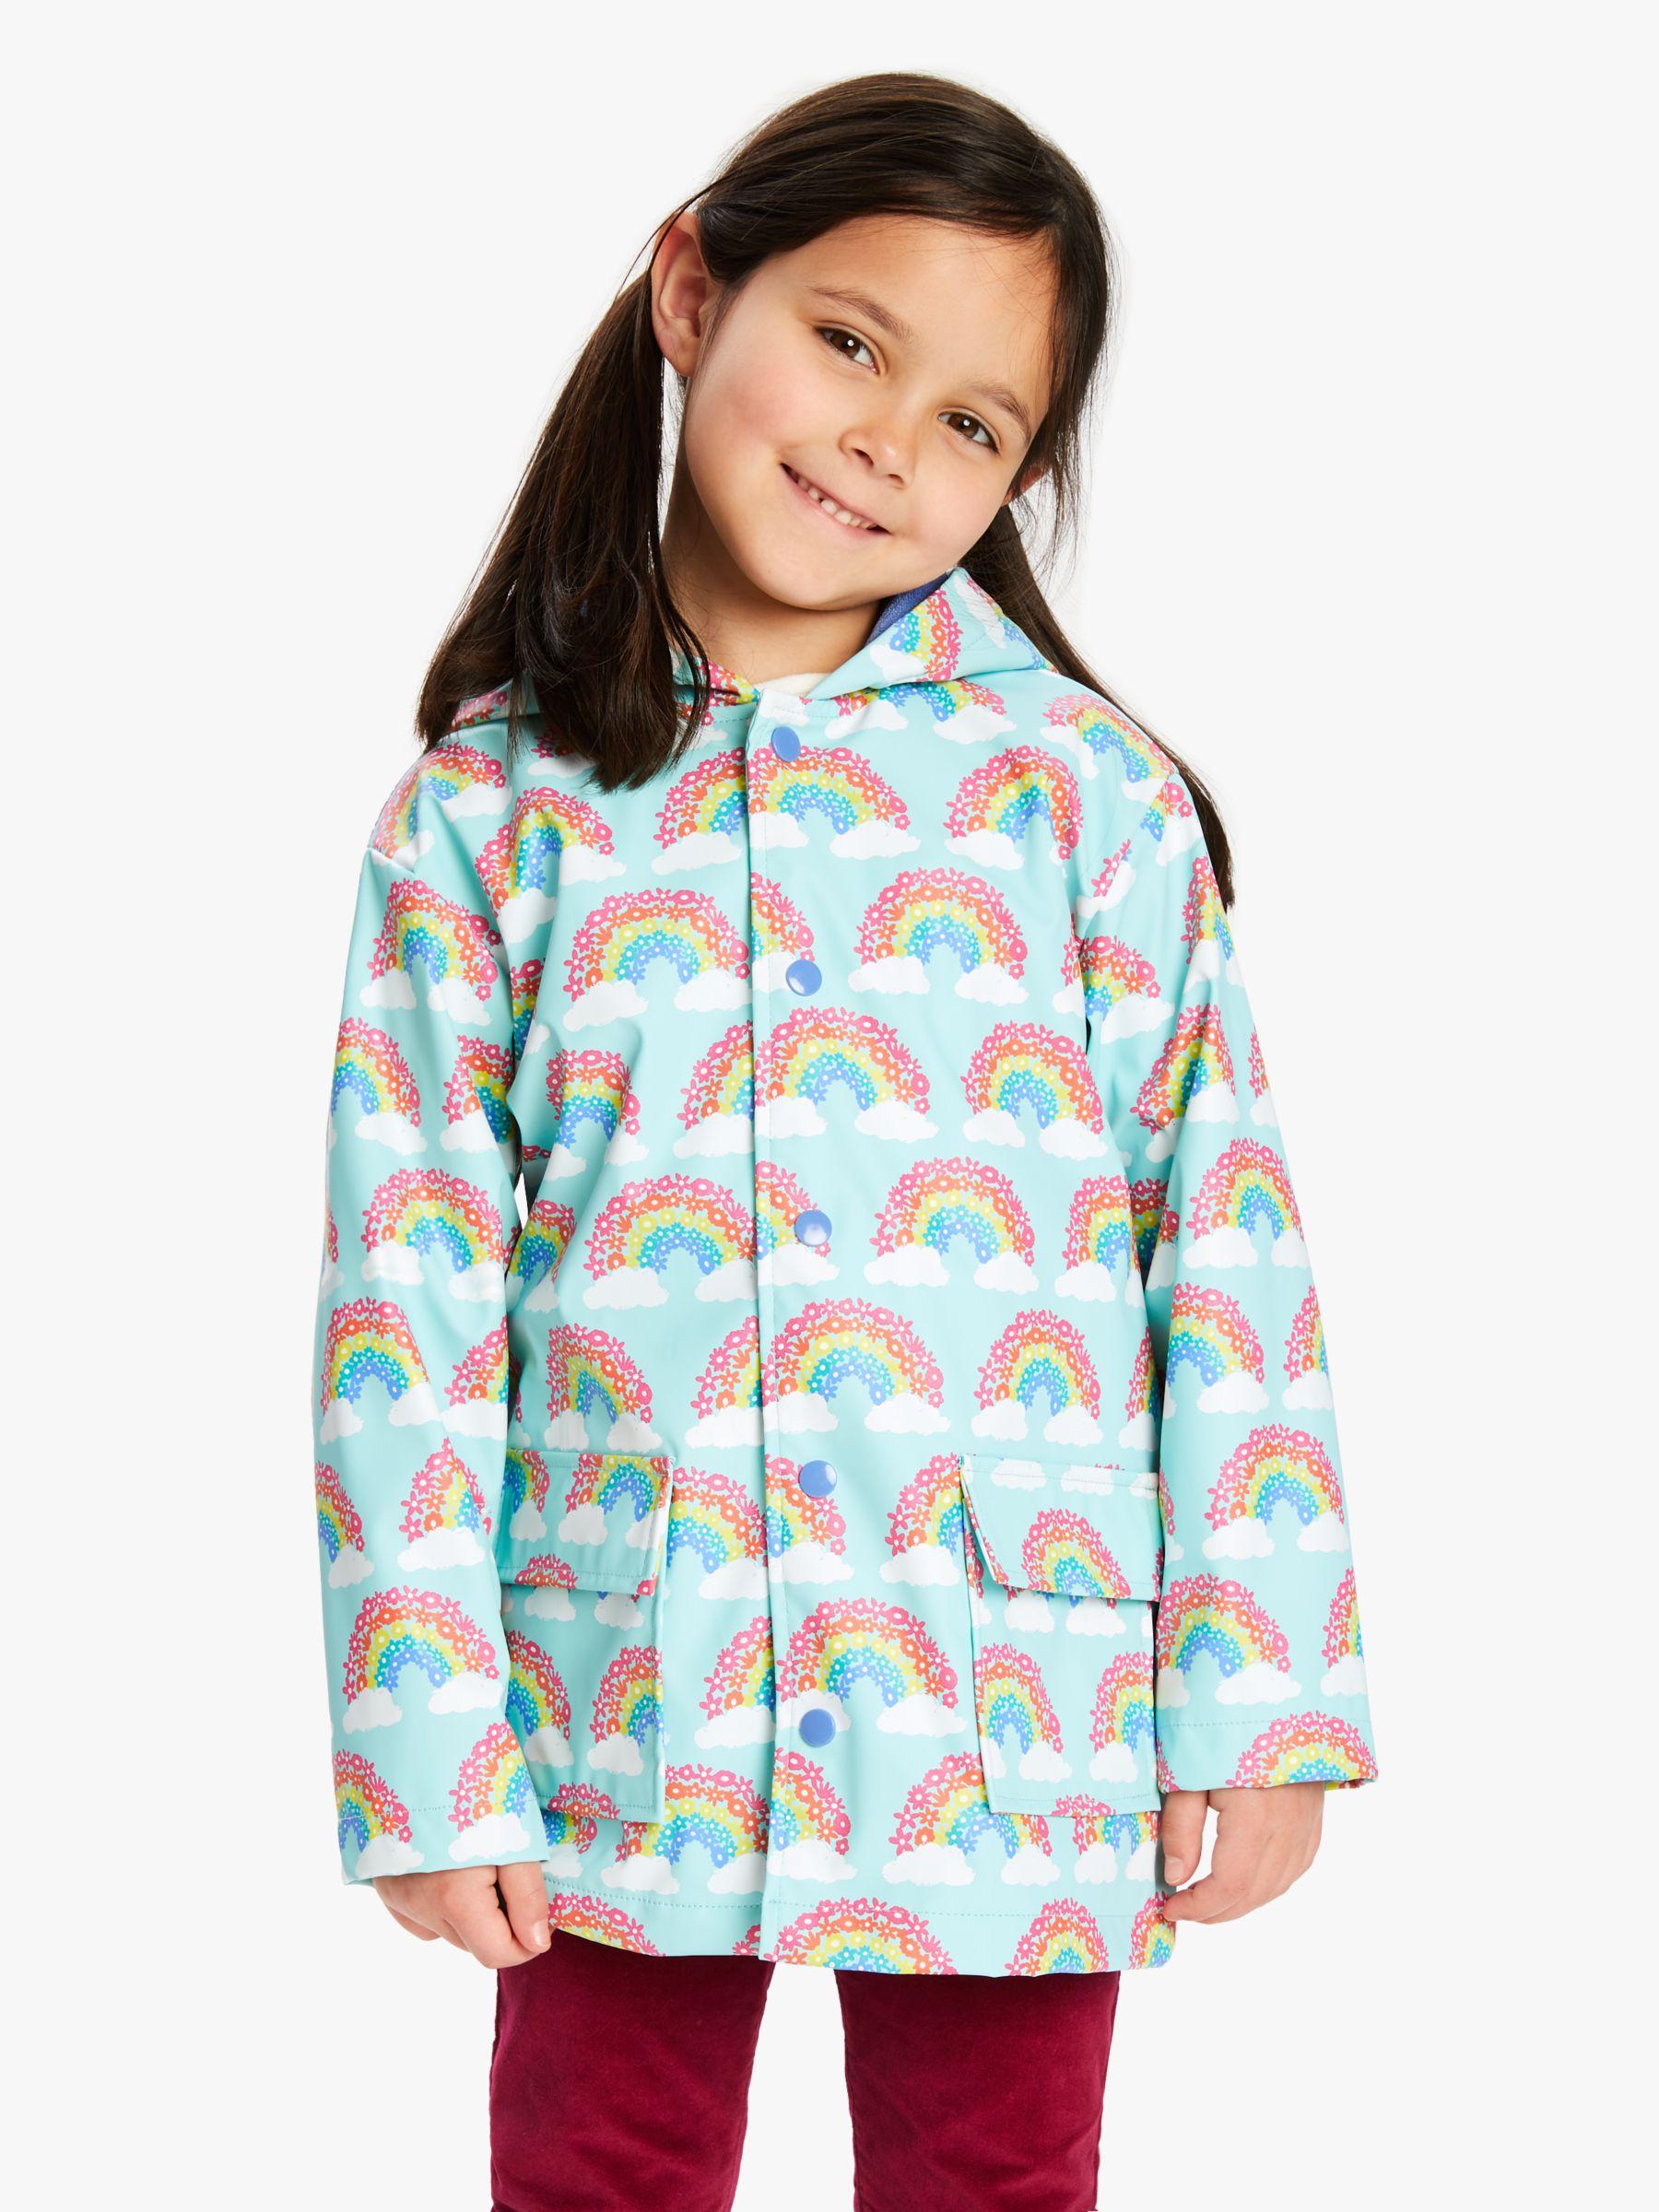 Hatley Hatley Girls' Magical Rainbows Raincoat, Blue